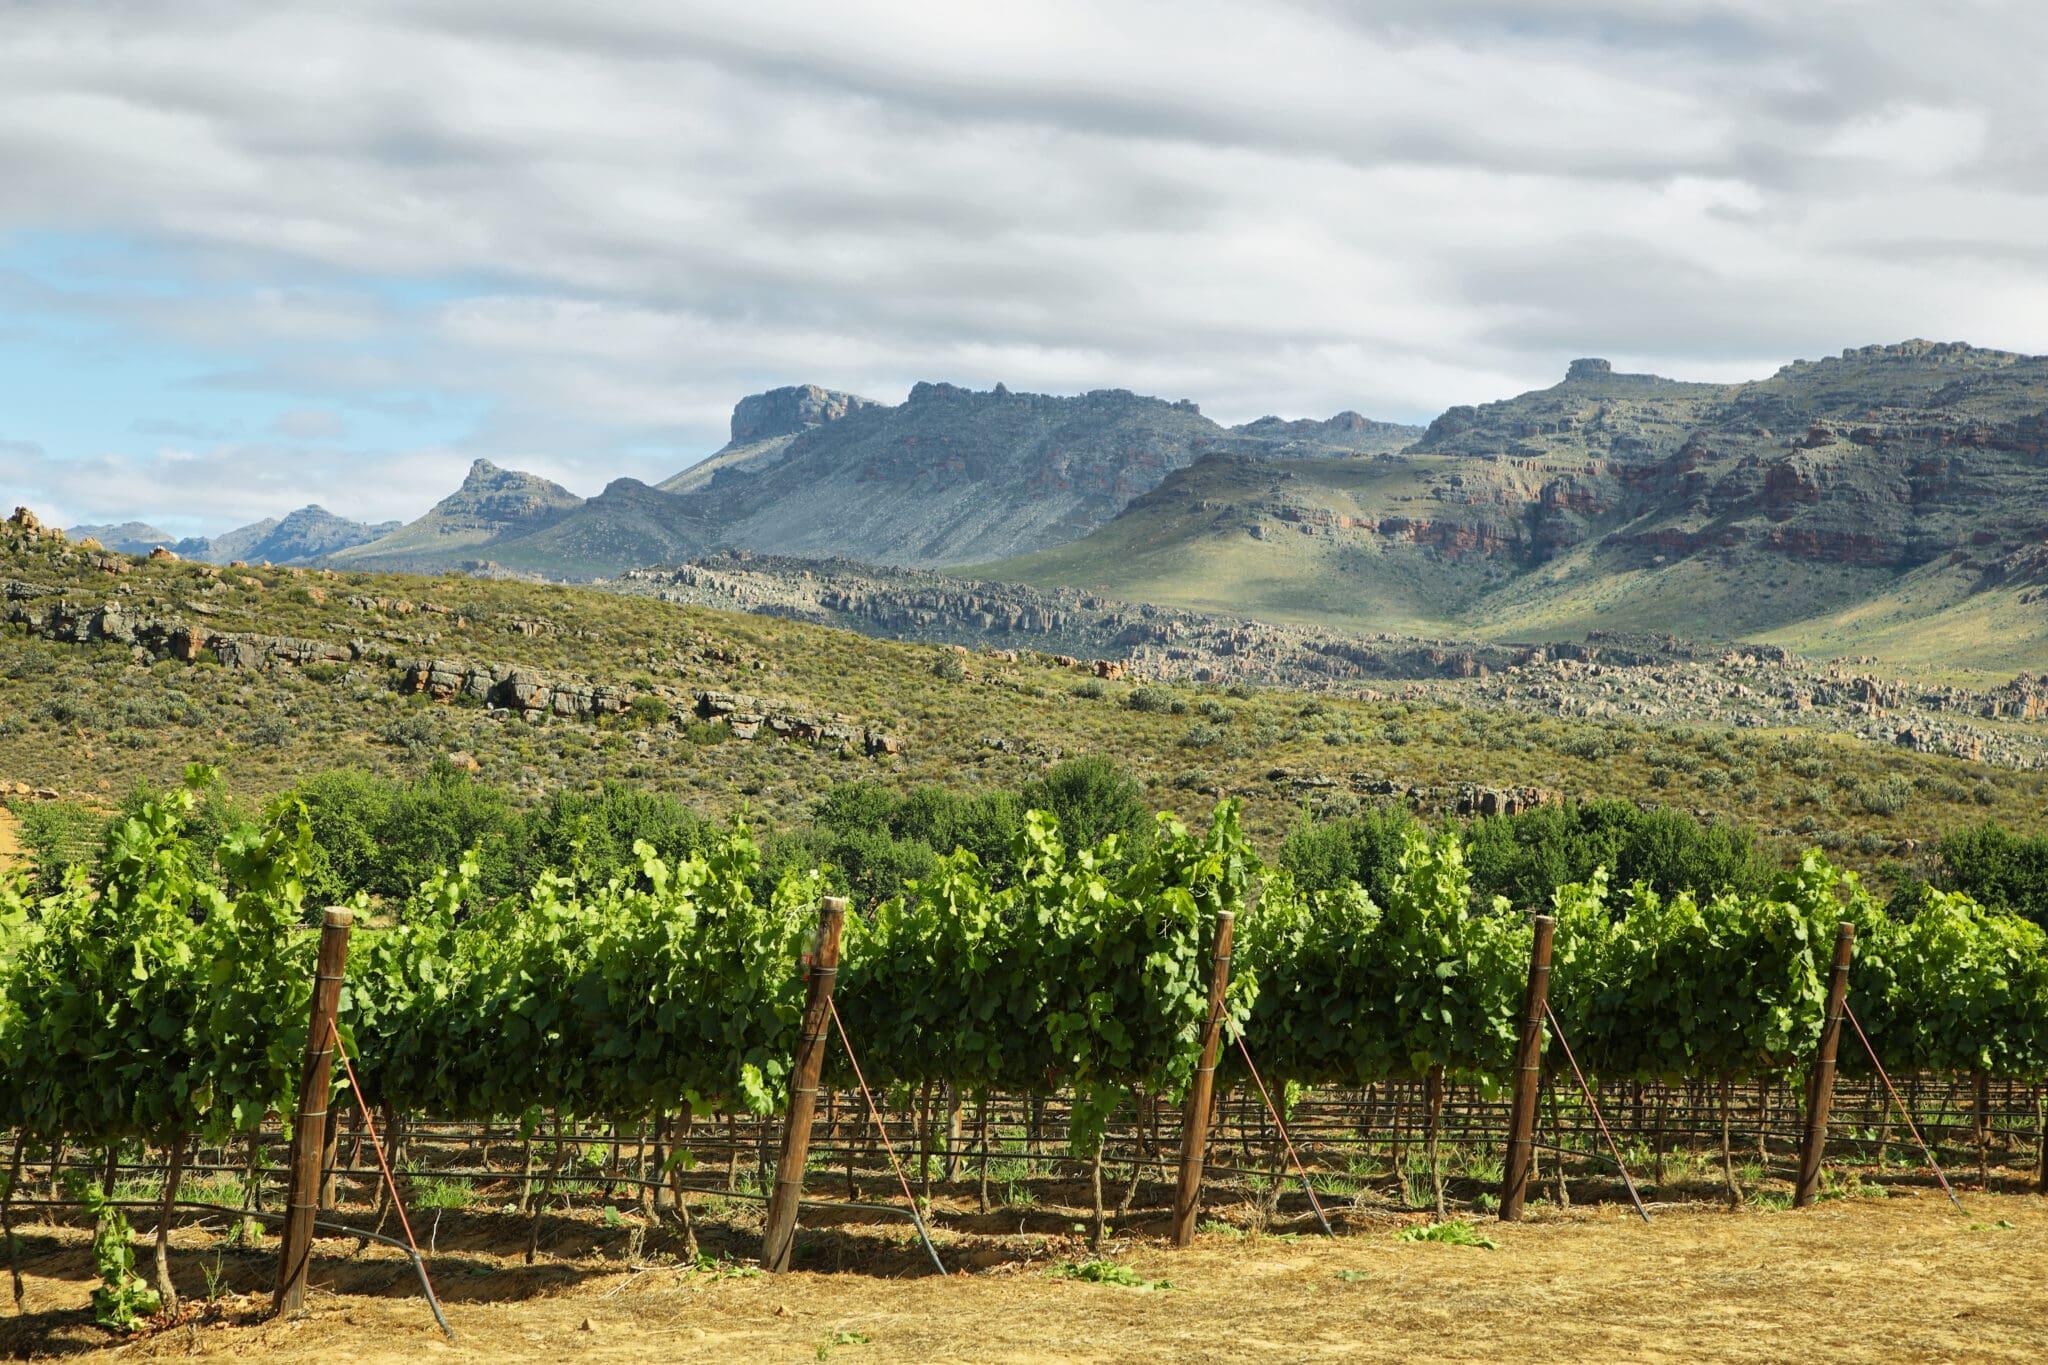 Vineyards in Cederberg nature reserve, South Africa